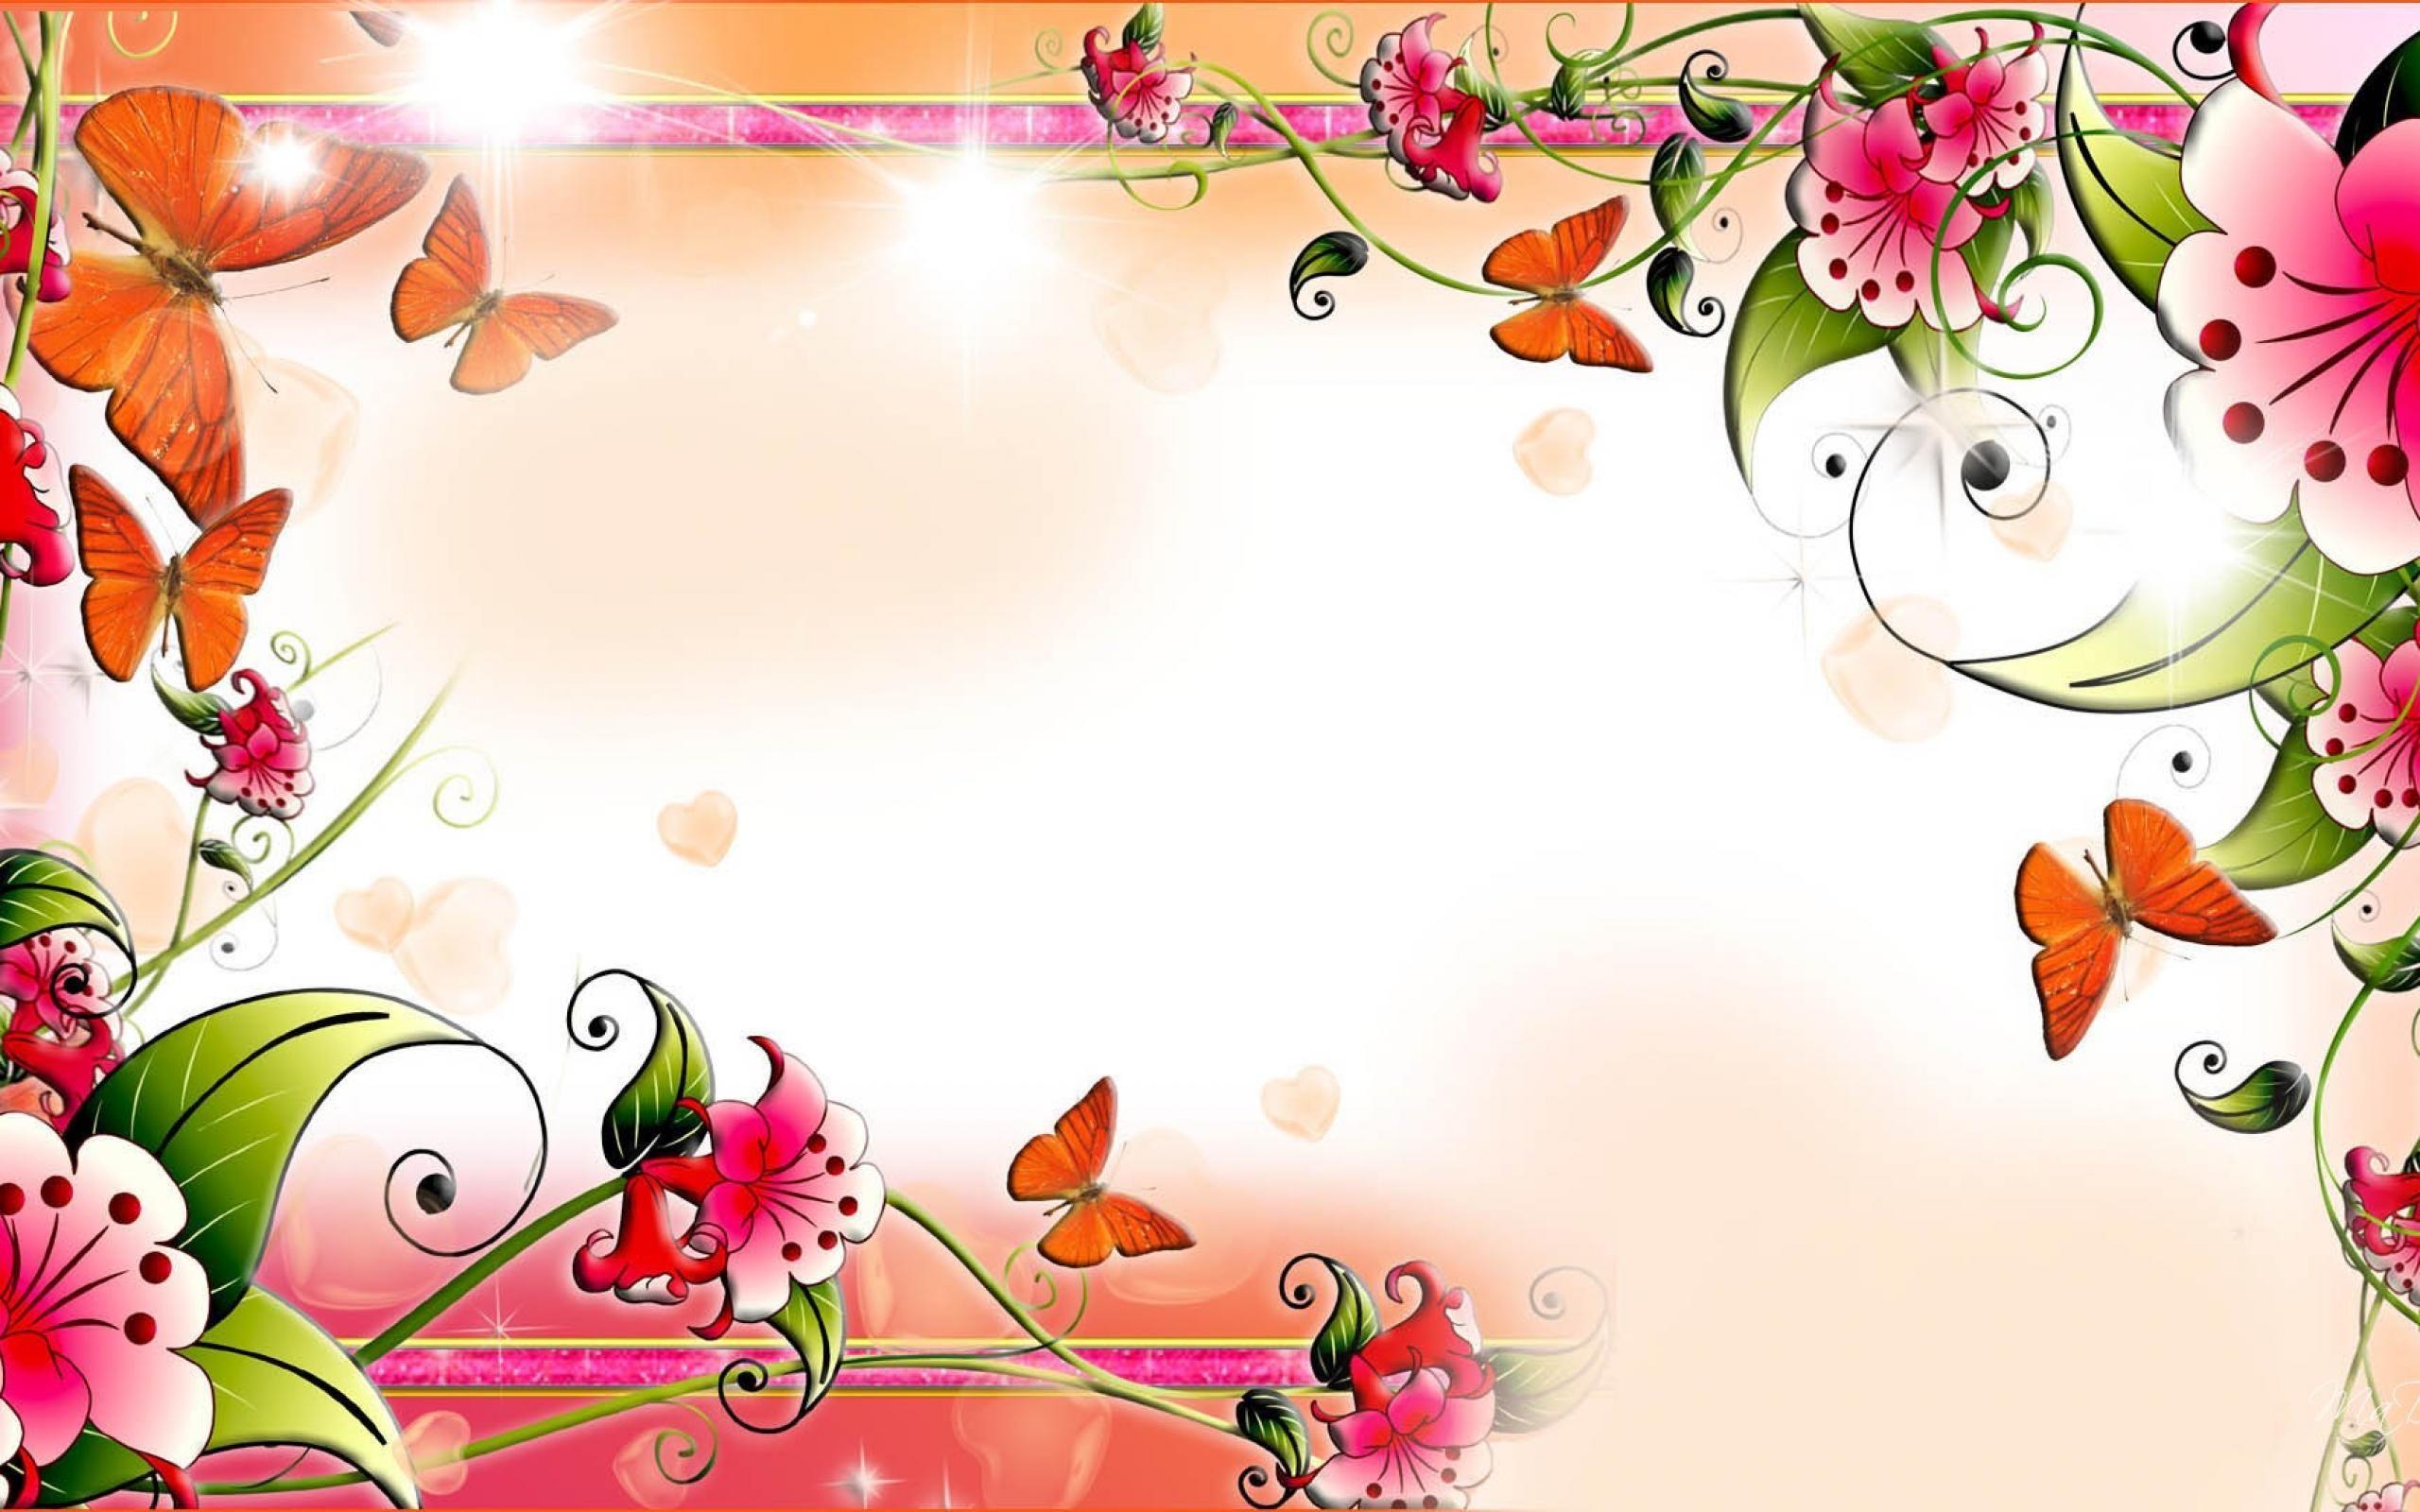 Spring Hd Desktop Wallpaper Spring Butterfly Hd Desktop